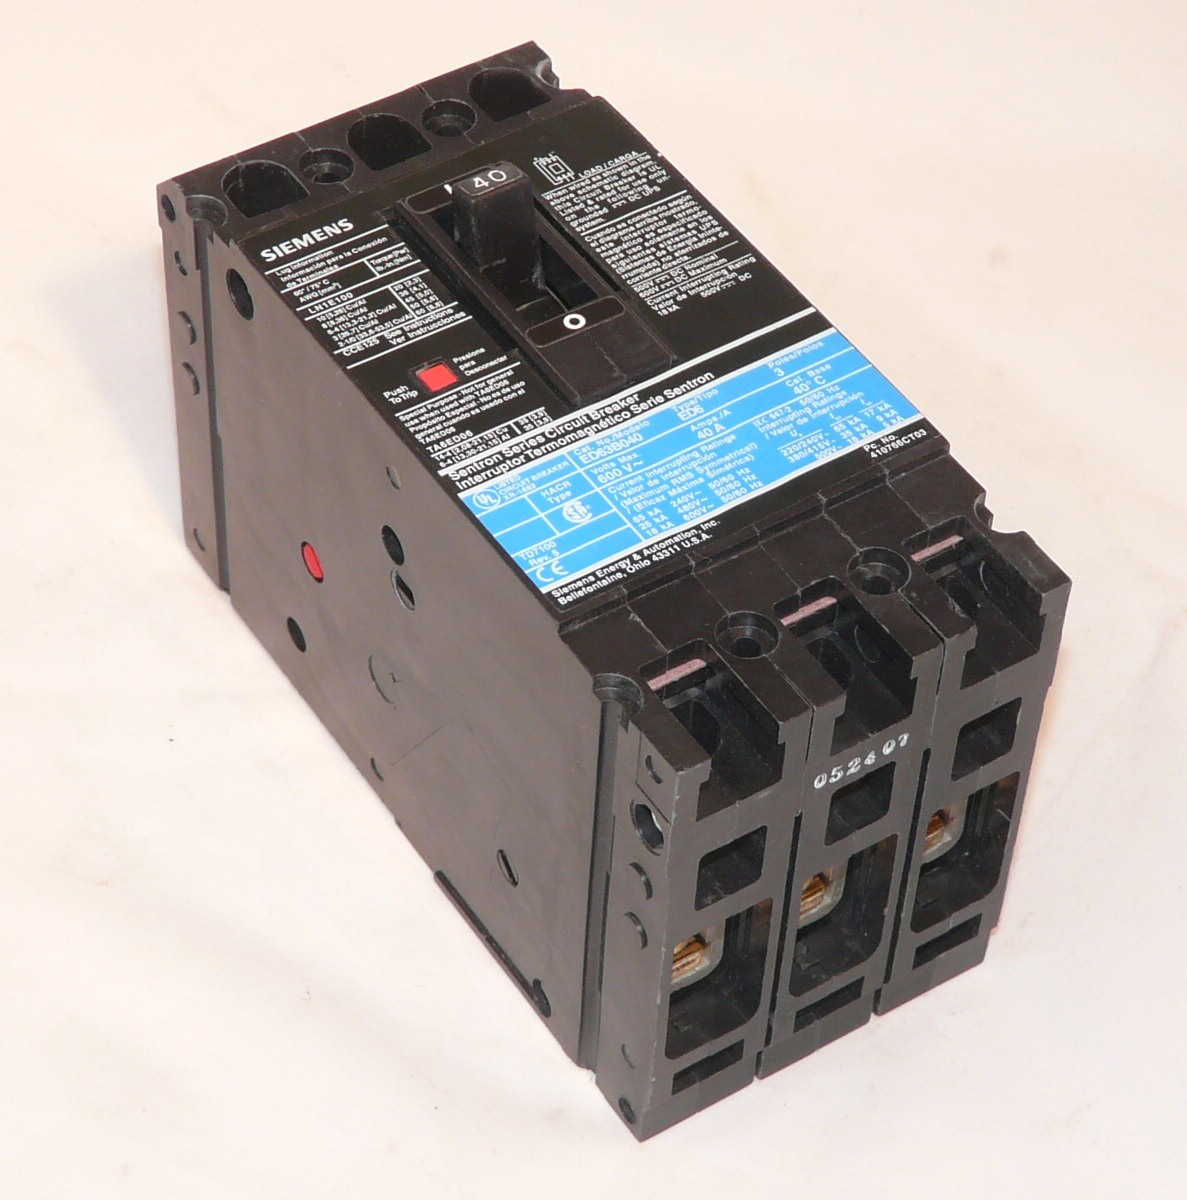 ed43b100 siemens circuit breaker new used and obsolete rh westcoastpower com